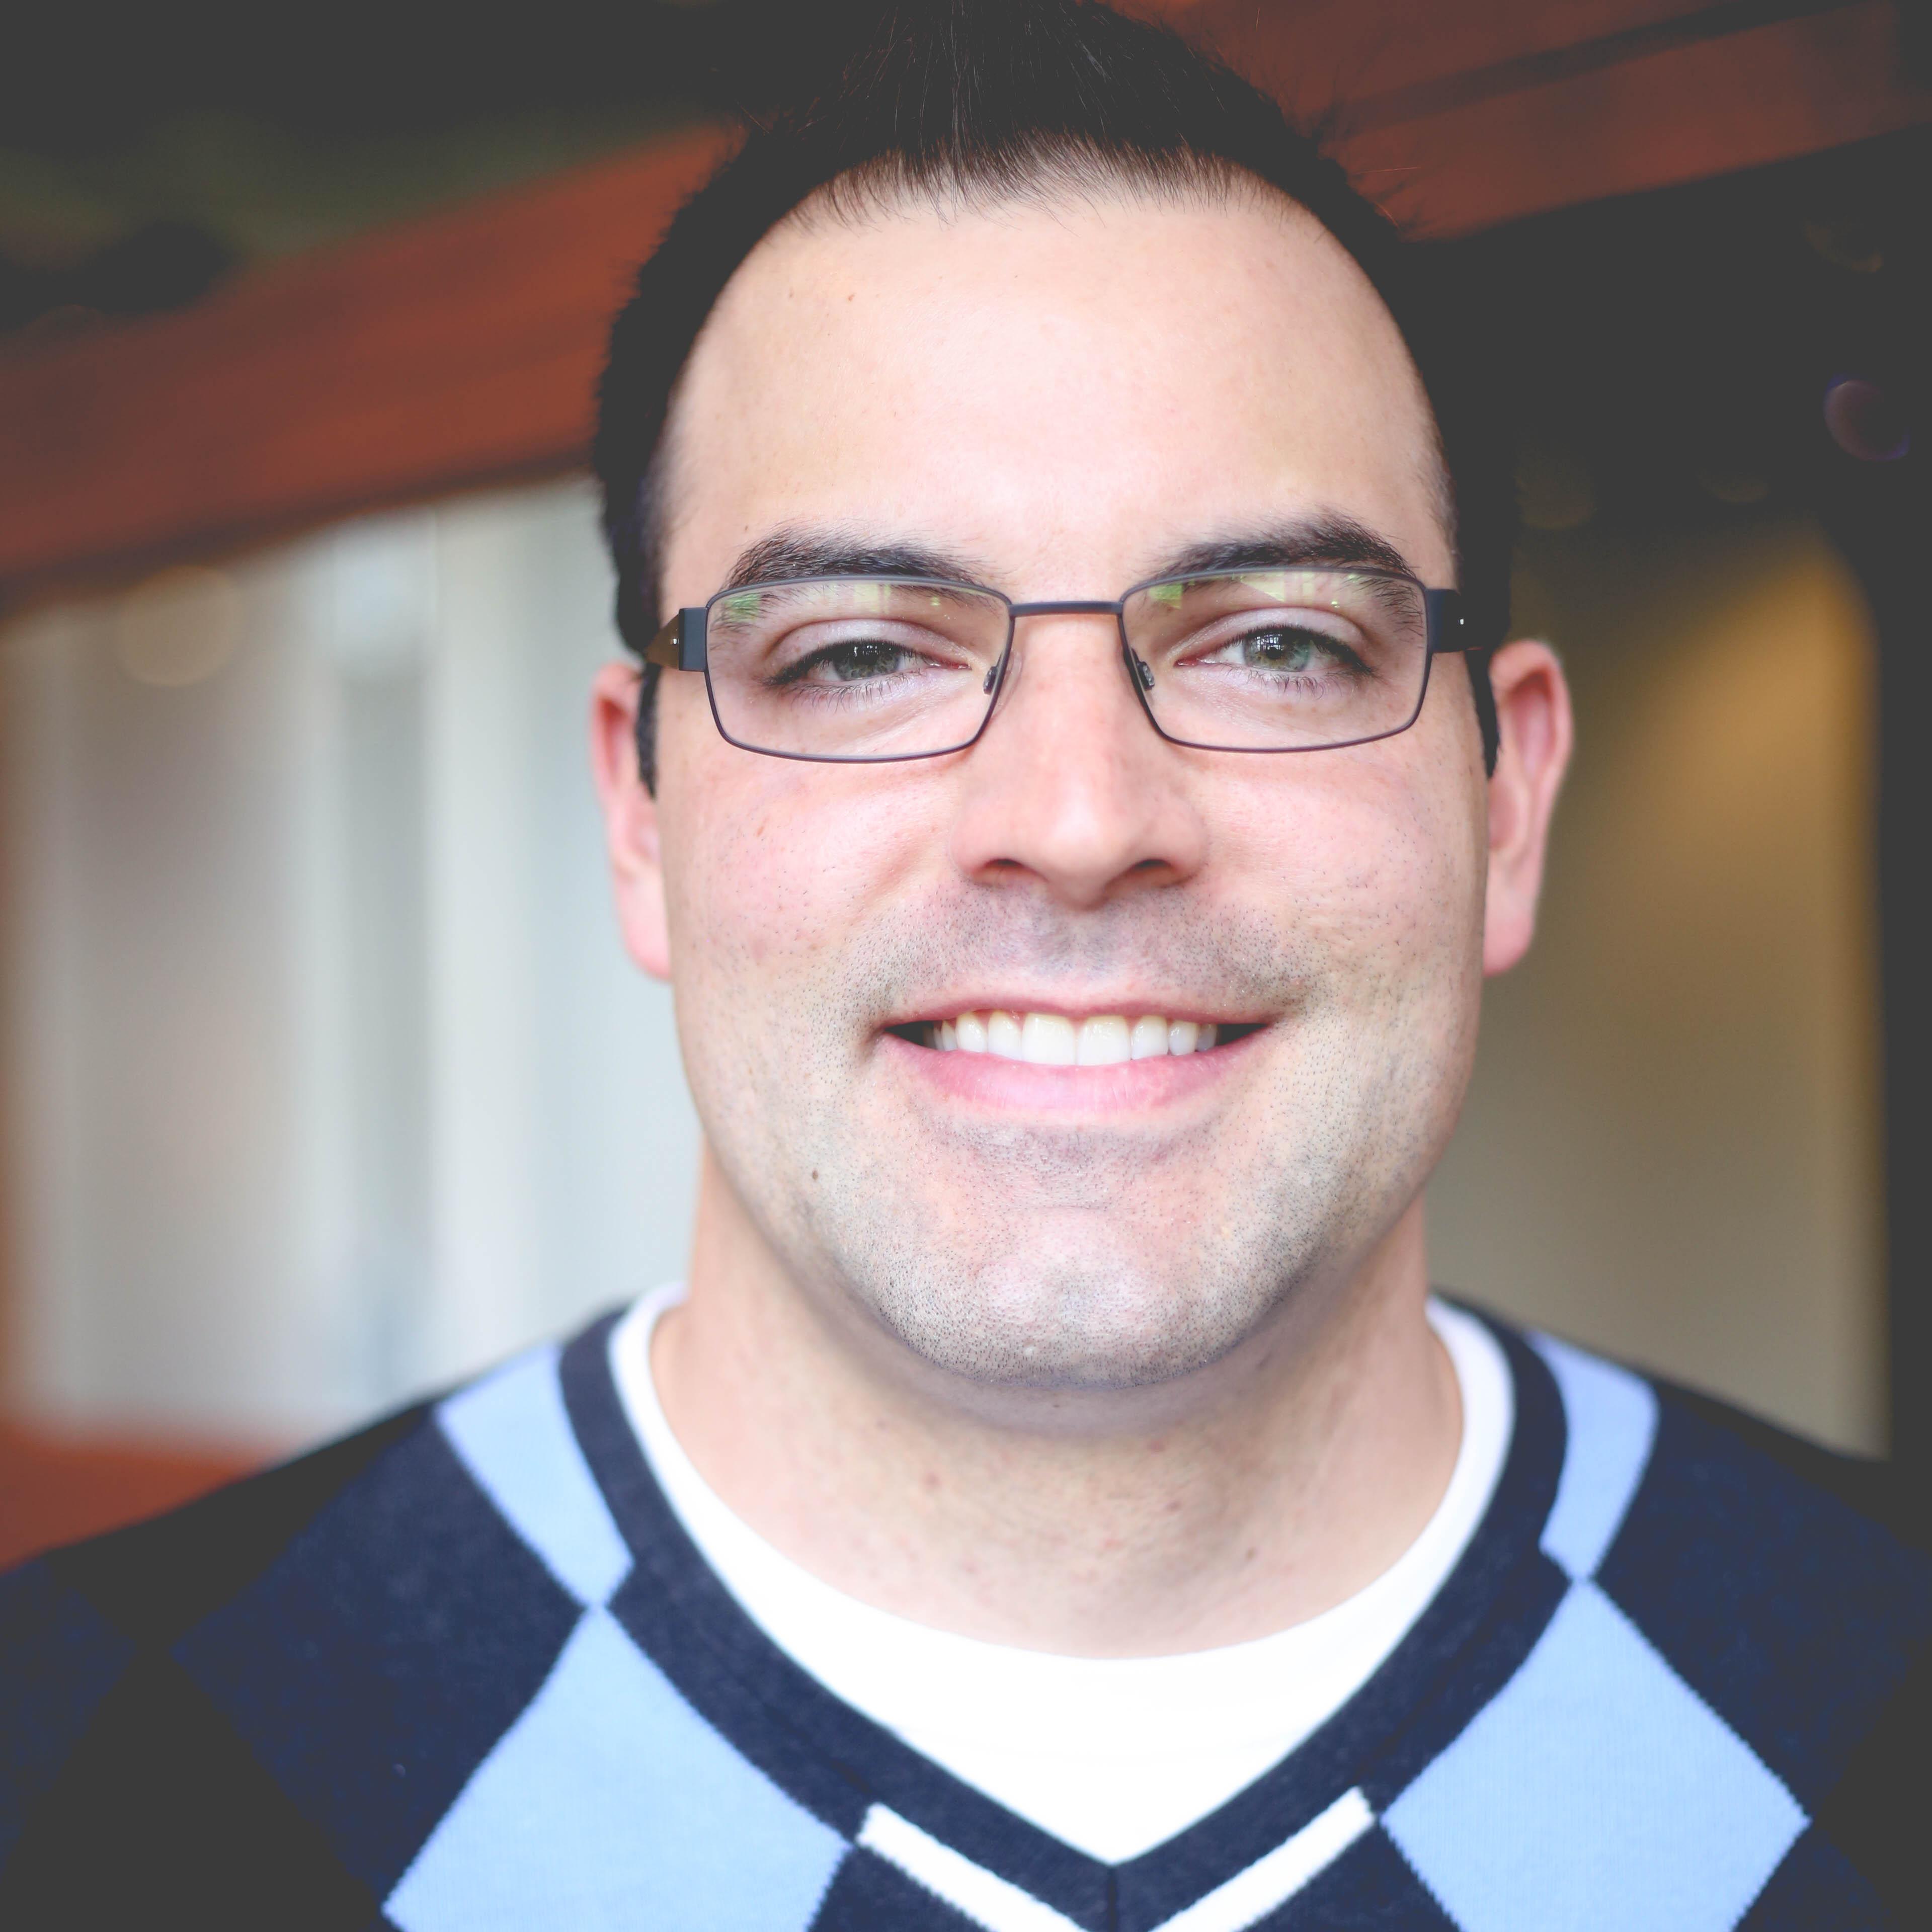 Jason Berwanger